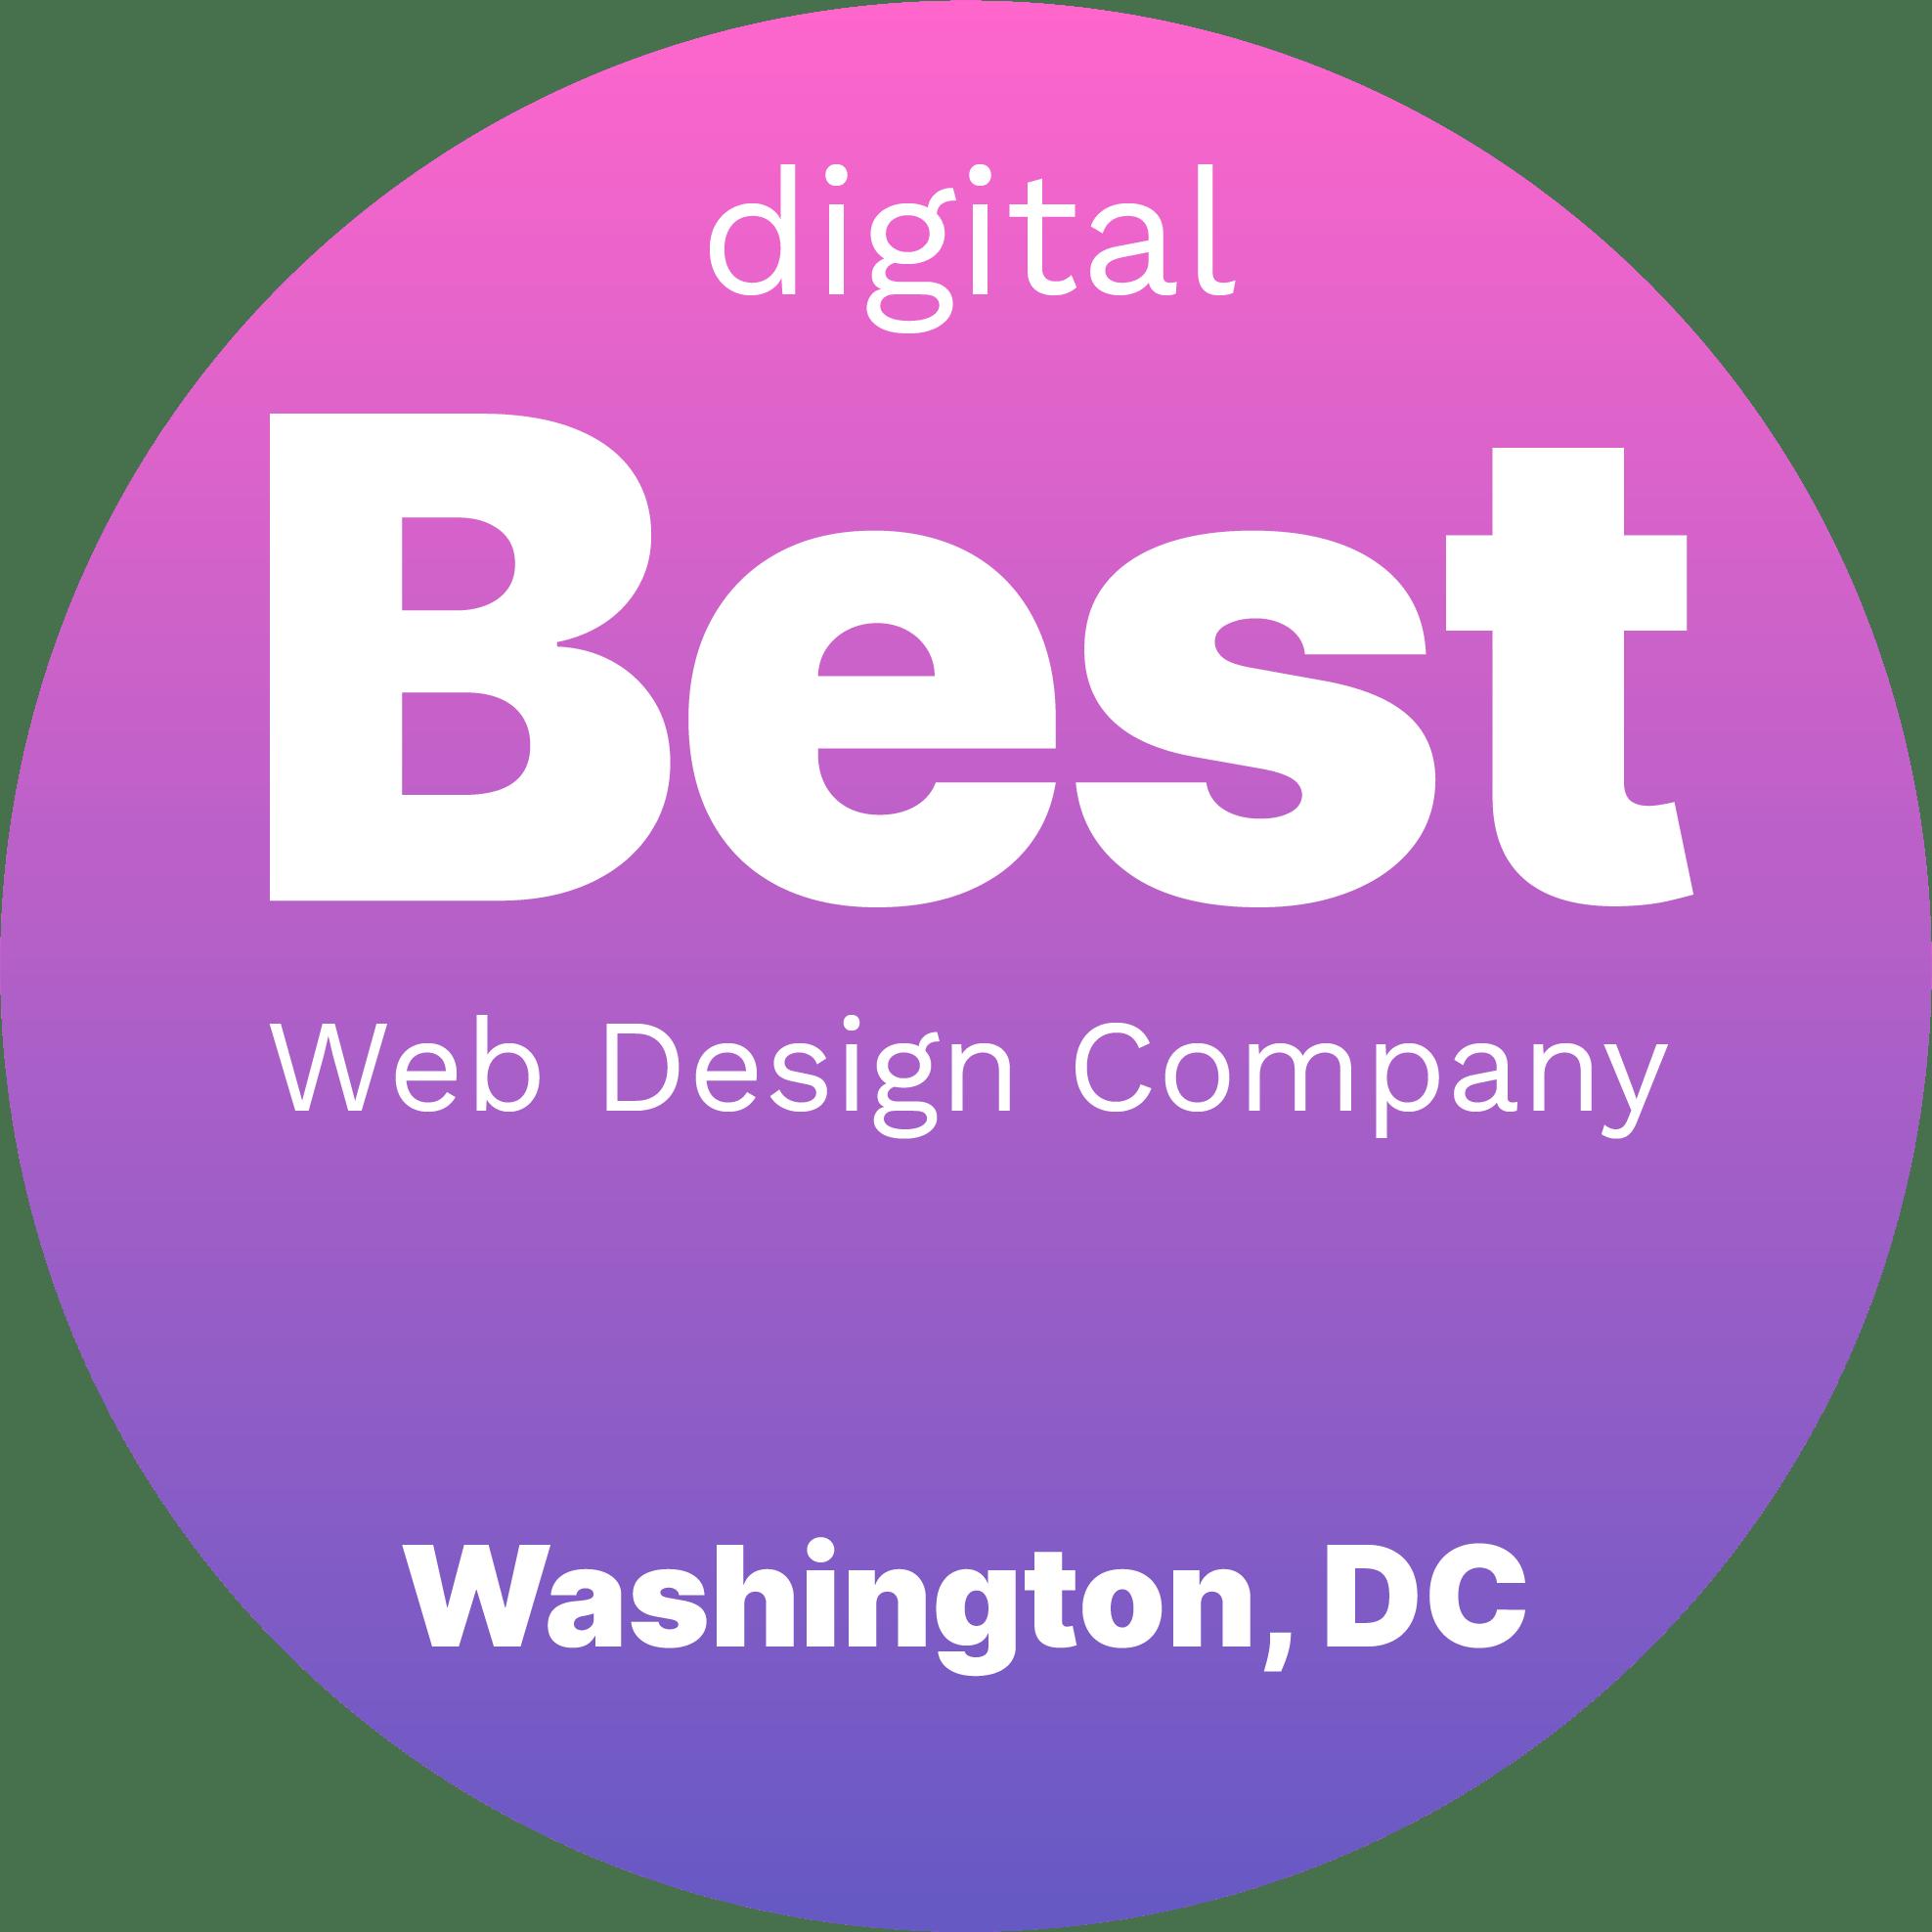 Best Web Design Companies in Washington, DC Badge